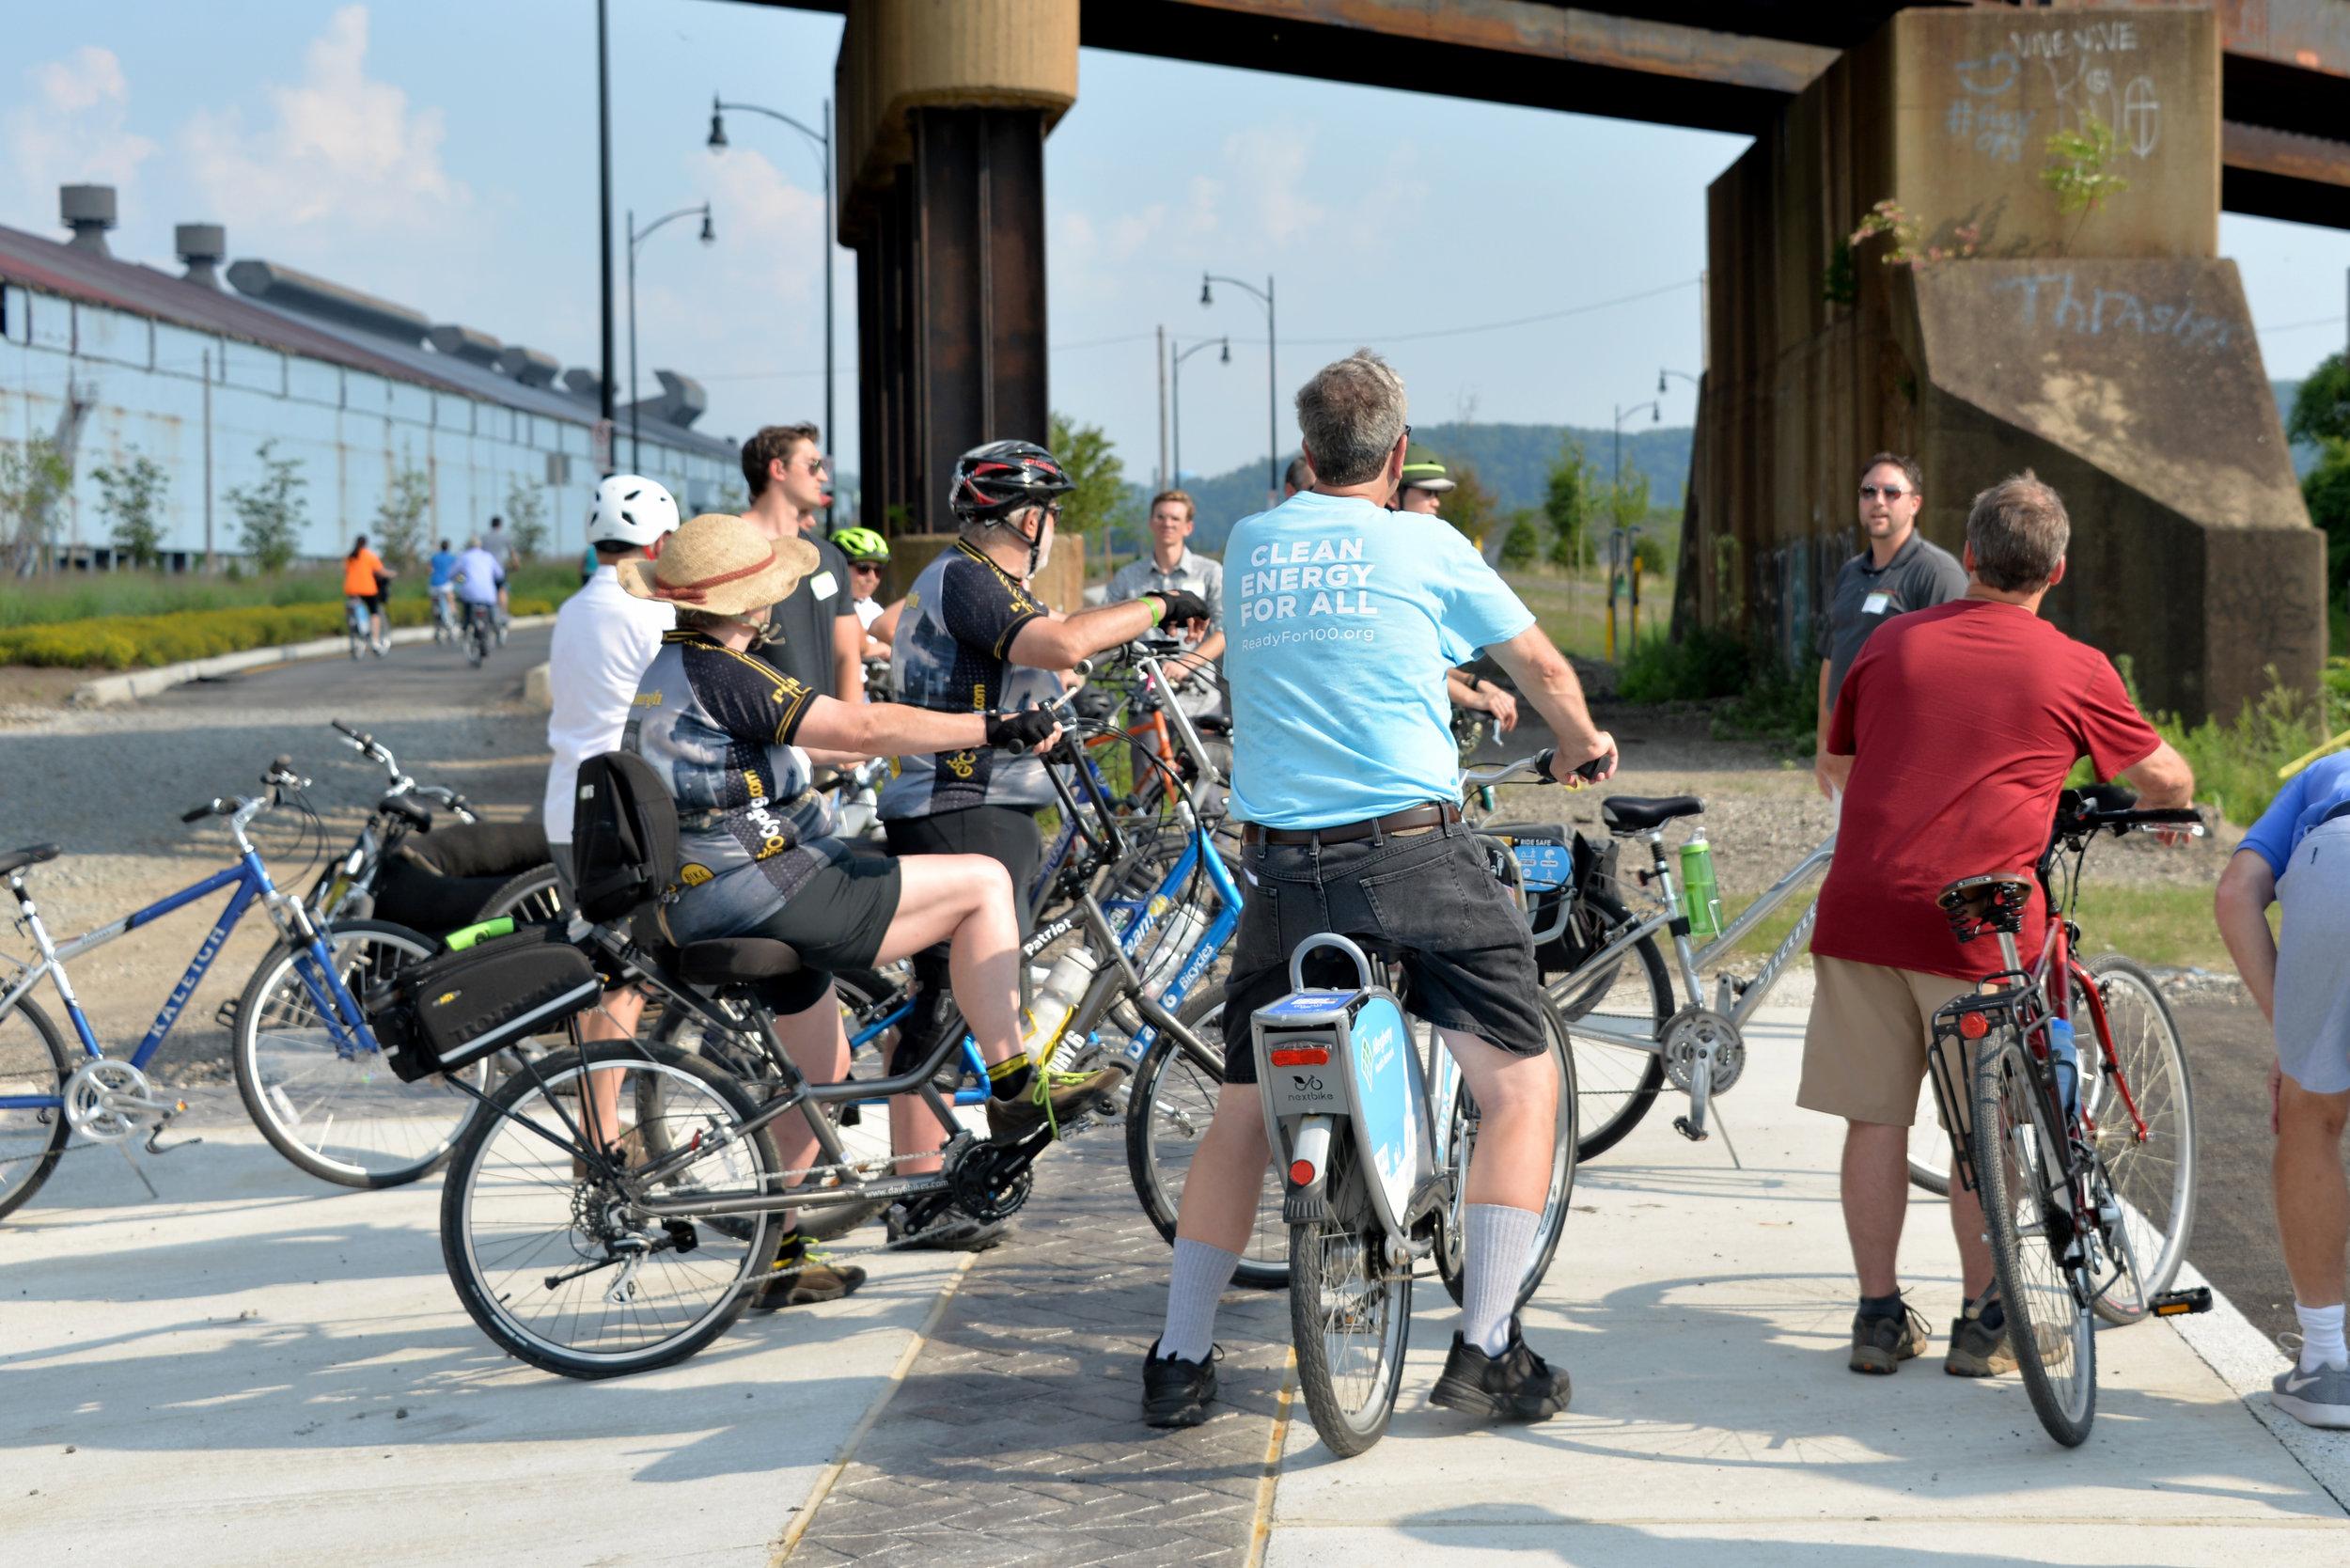 almono-gba-bike-tour_35915240251_o.jpg